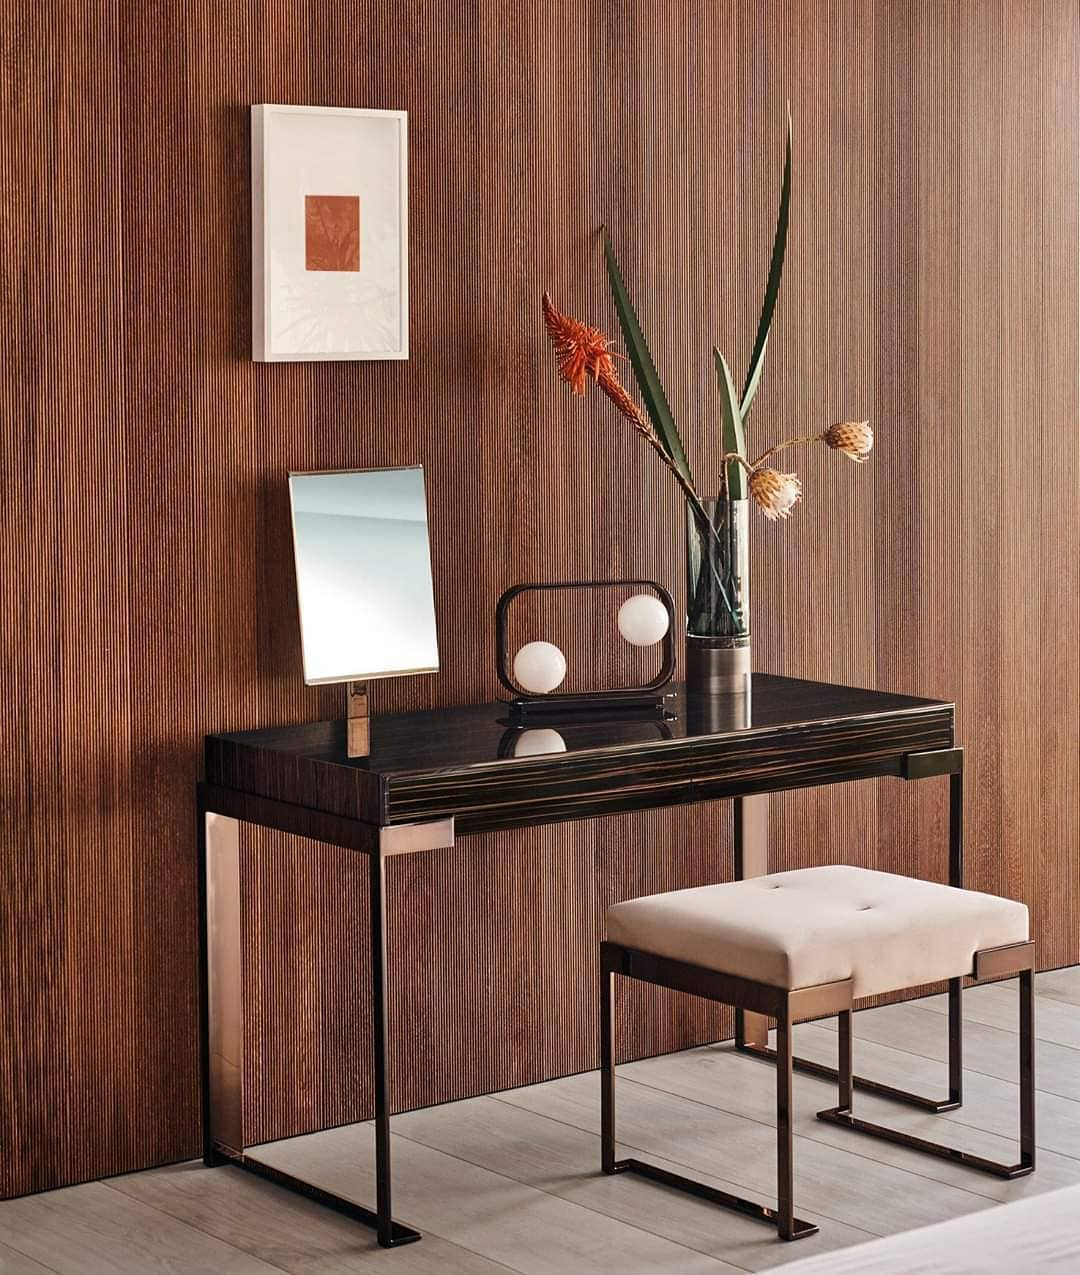 Aura lady desk owns all your beauty secr...